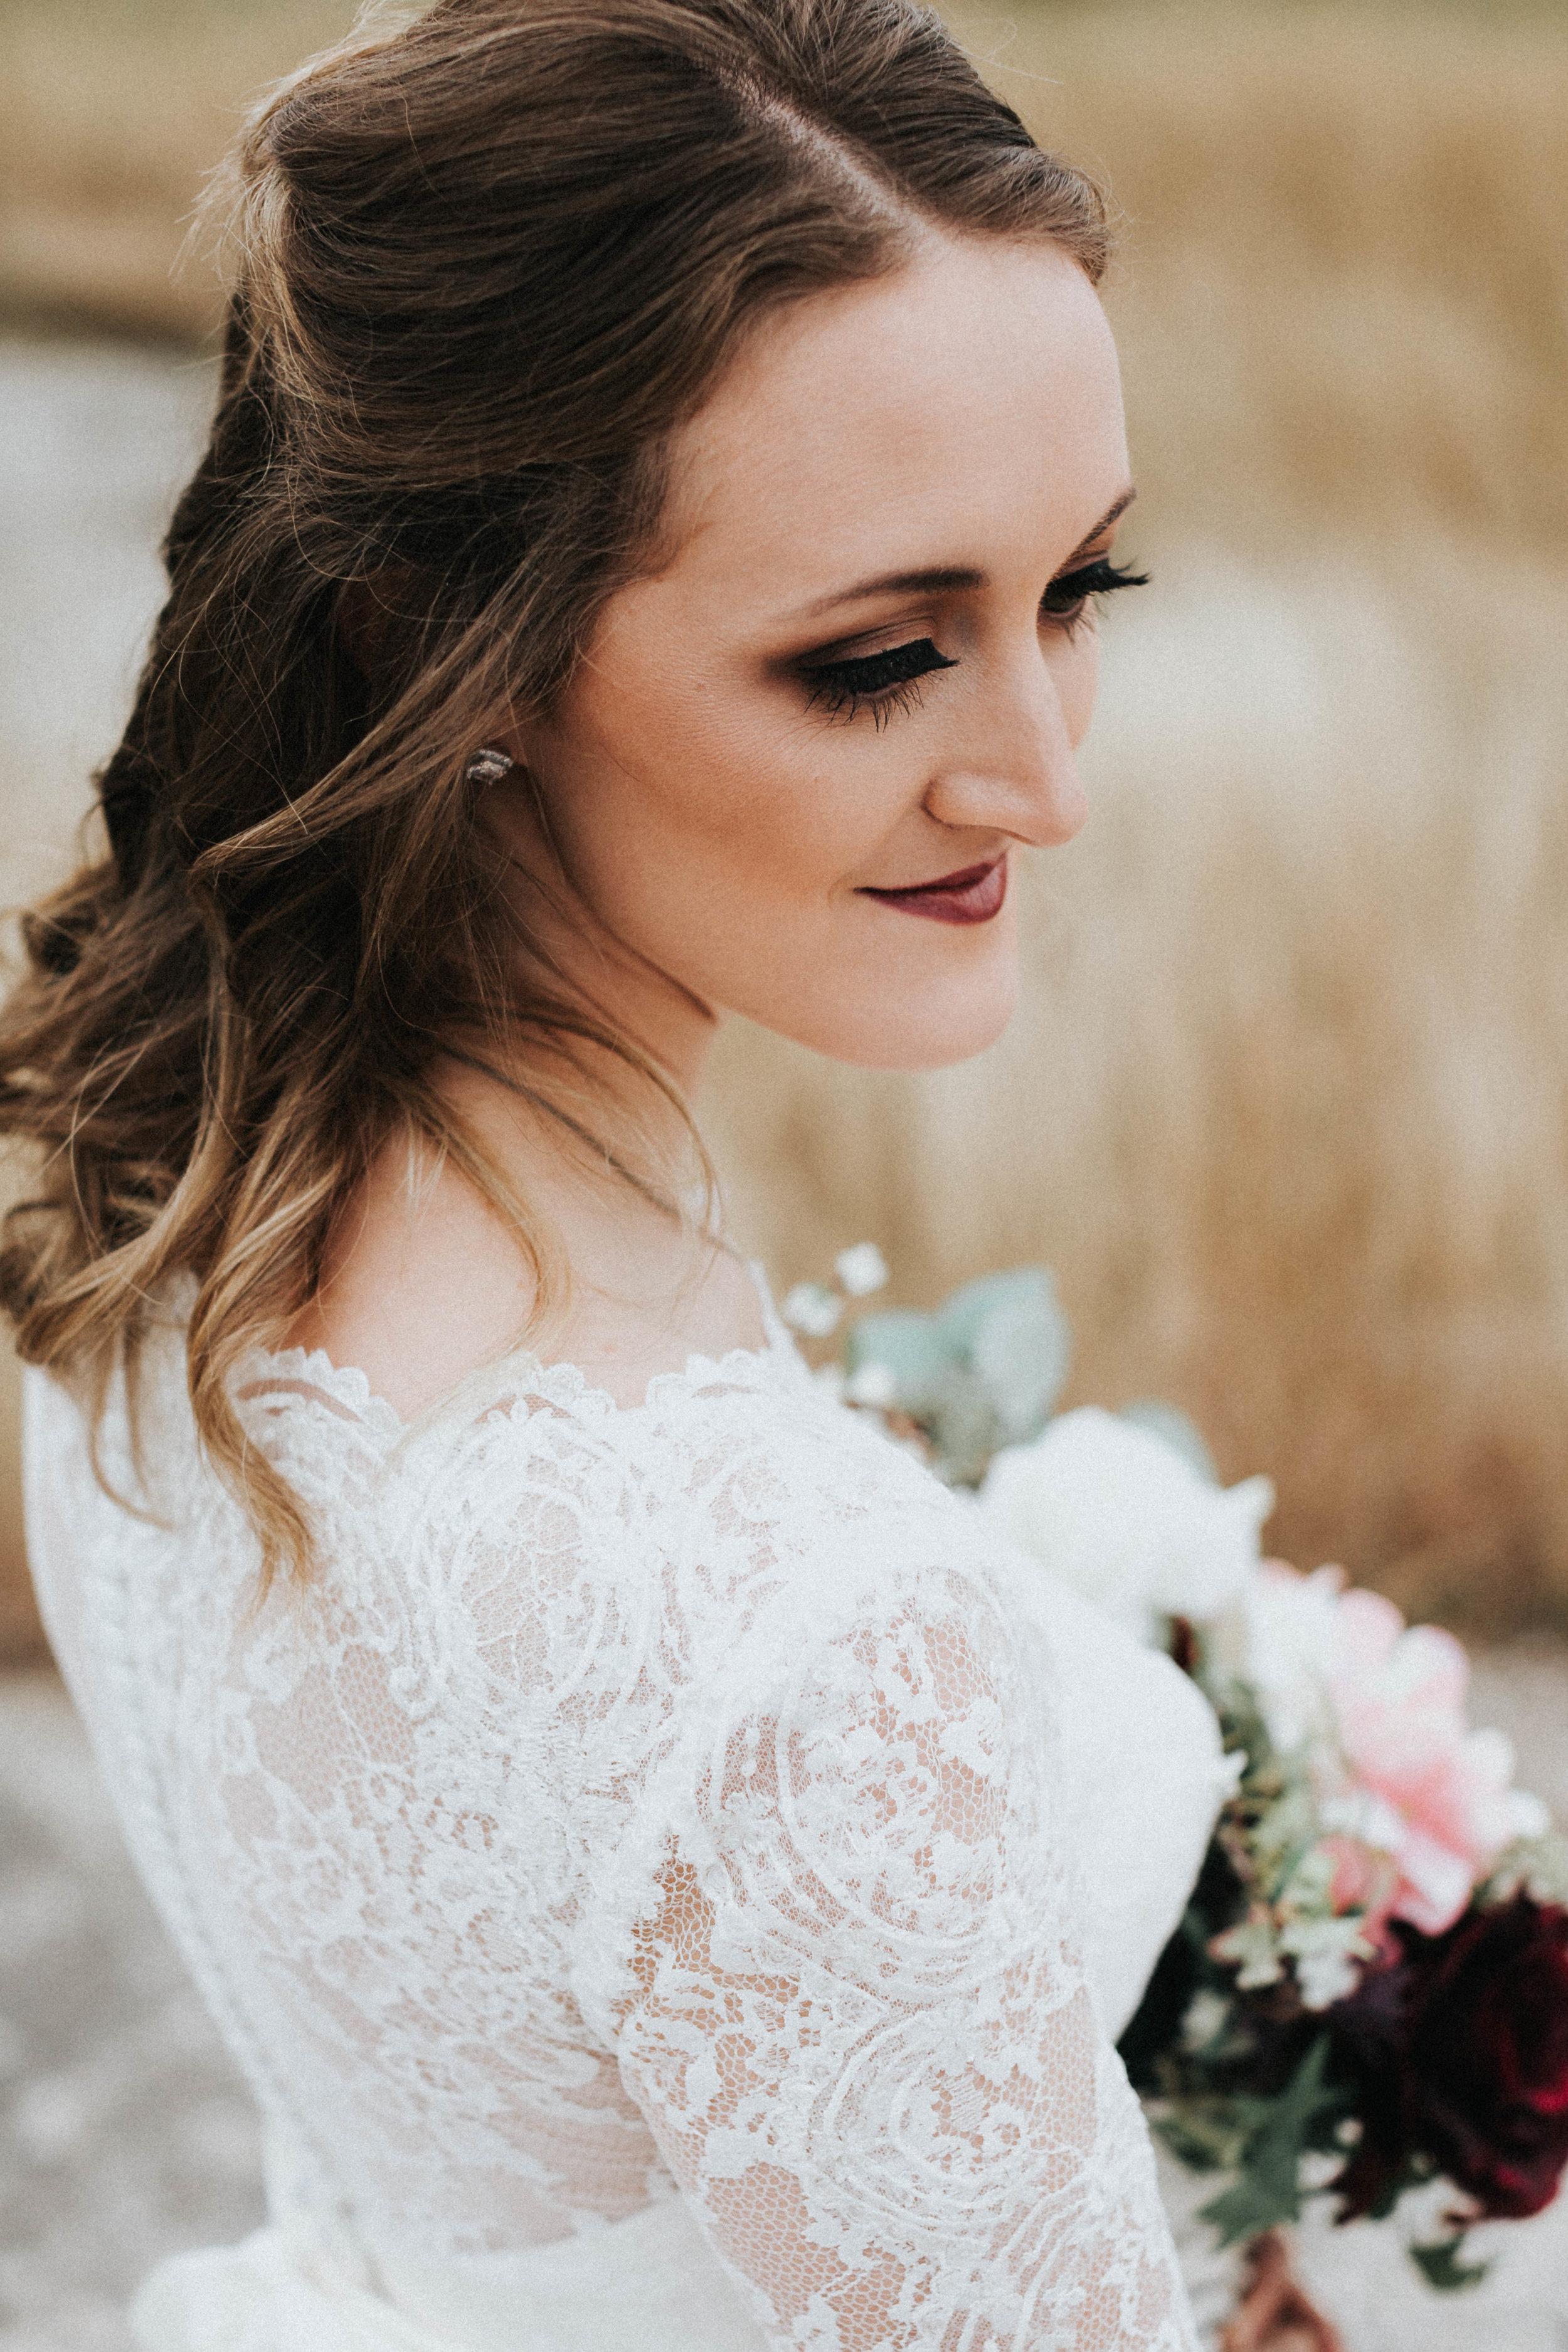 lake-charles-wedding-photography13.jpg